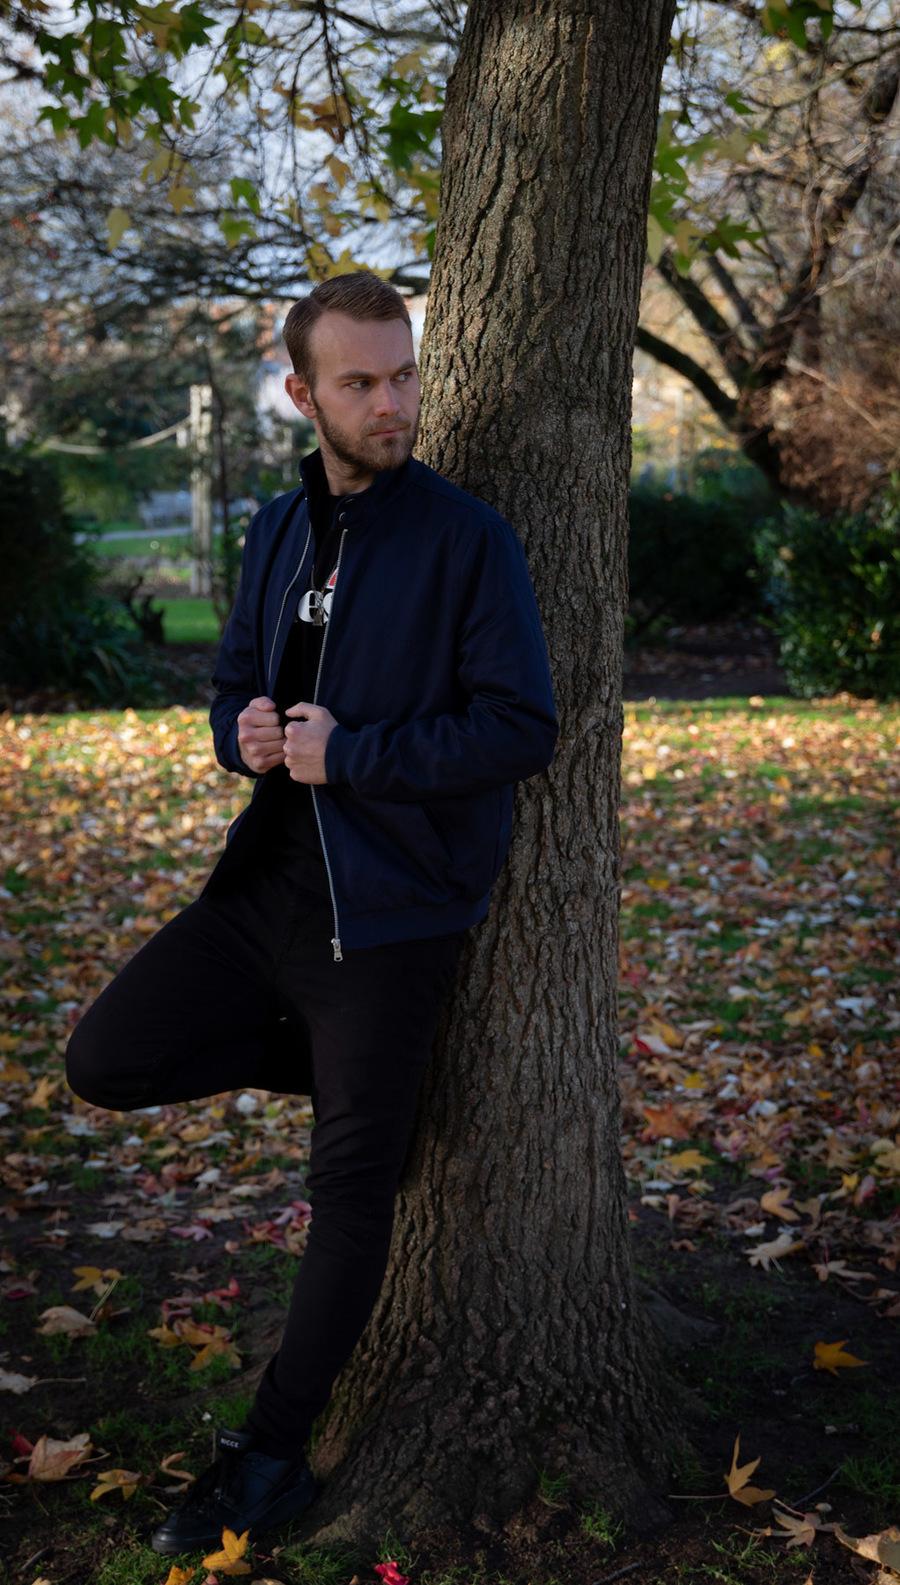 Photography by Fran Stockwell, Model Luke Ellis / Uploaded 15th January 2021 @ 05:10 PM